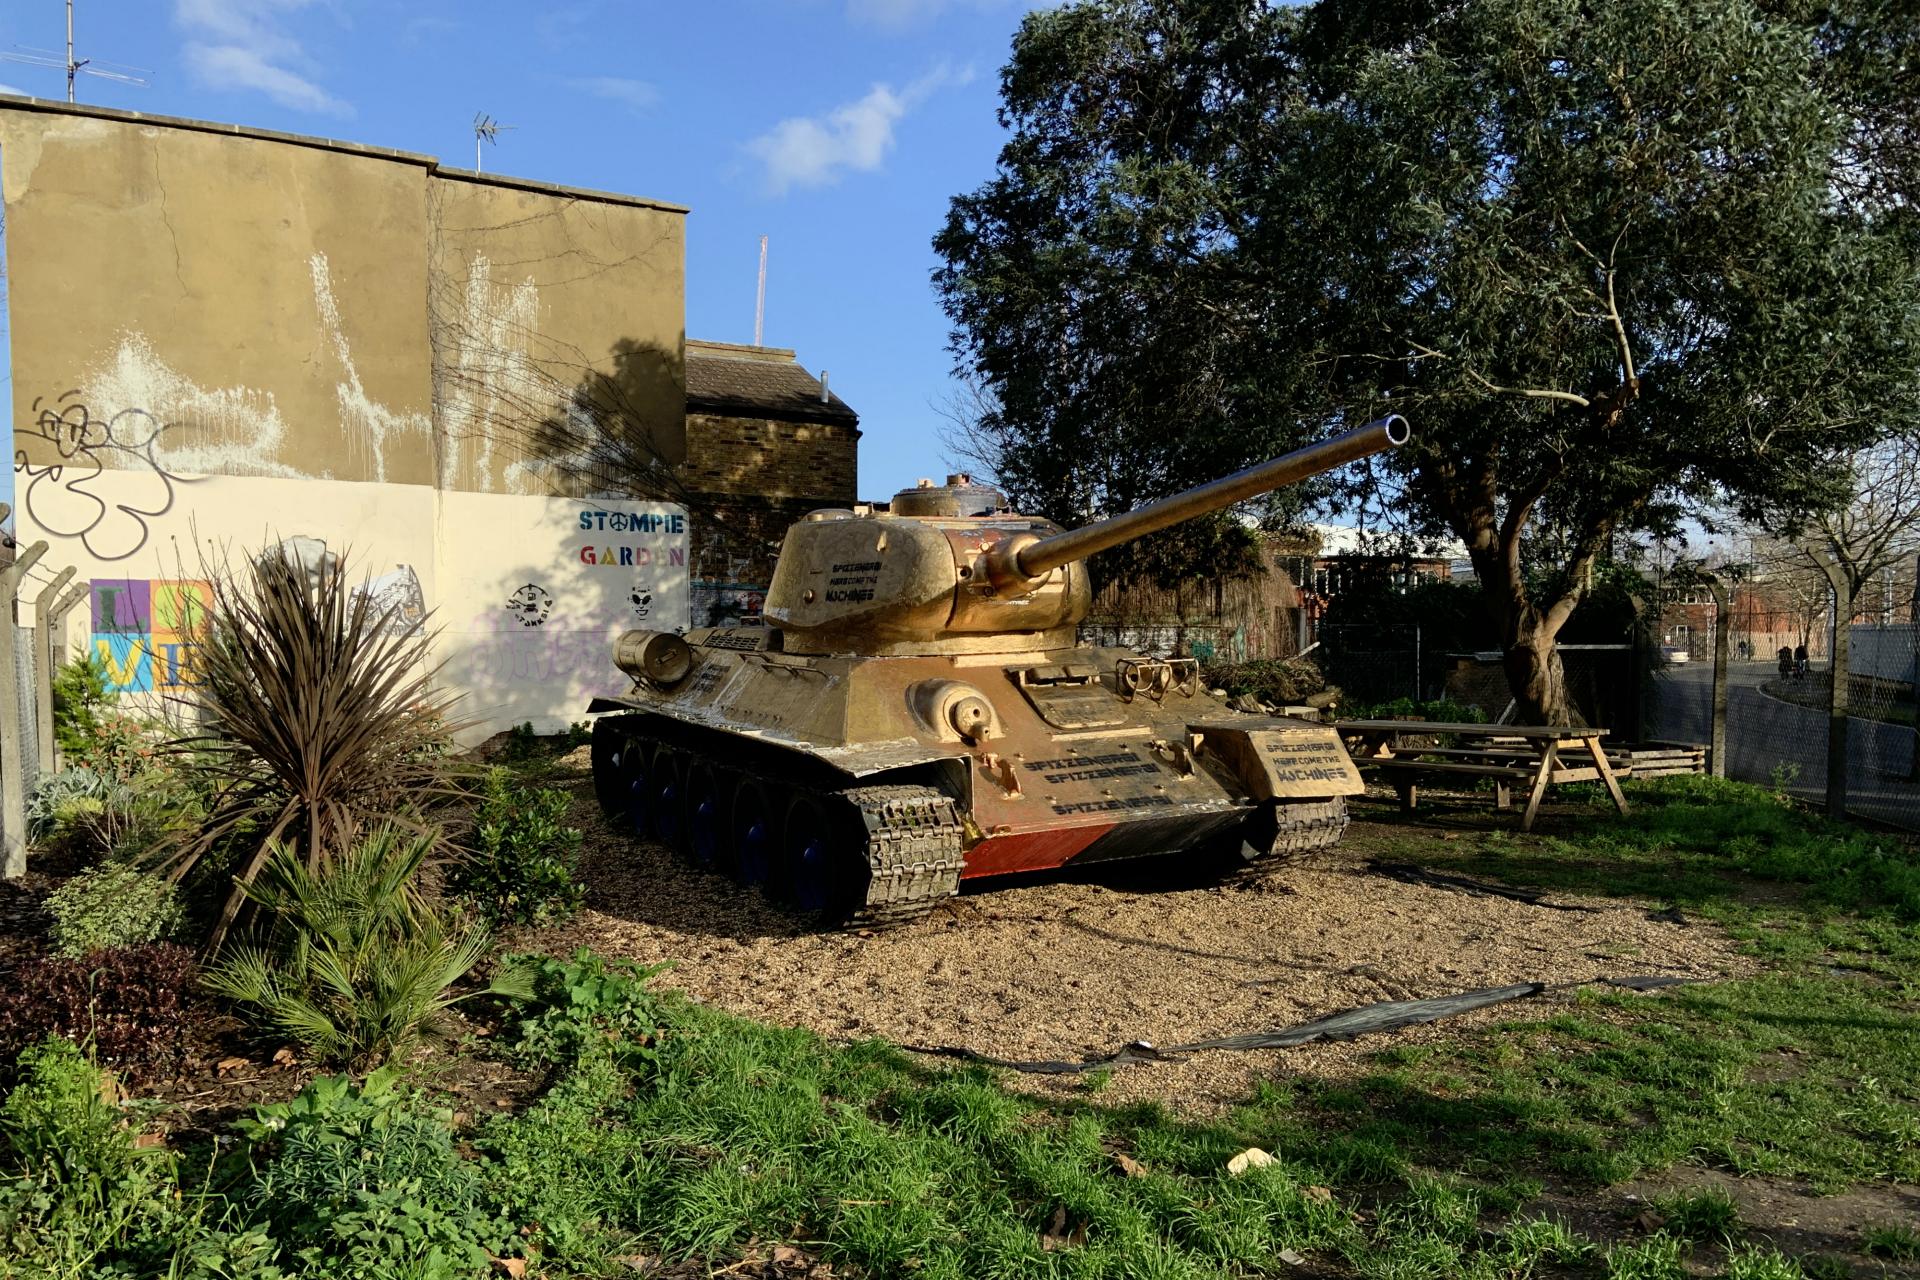 Stompie the Tank